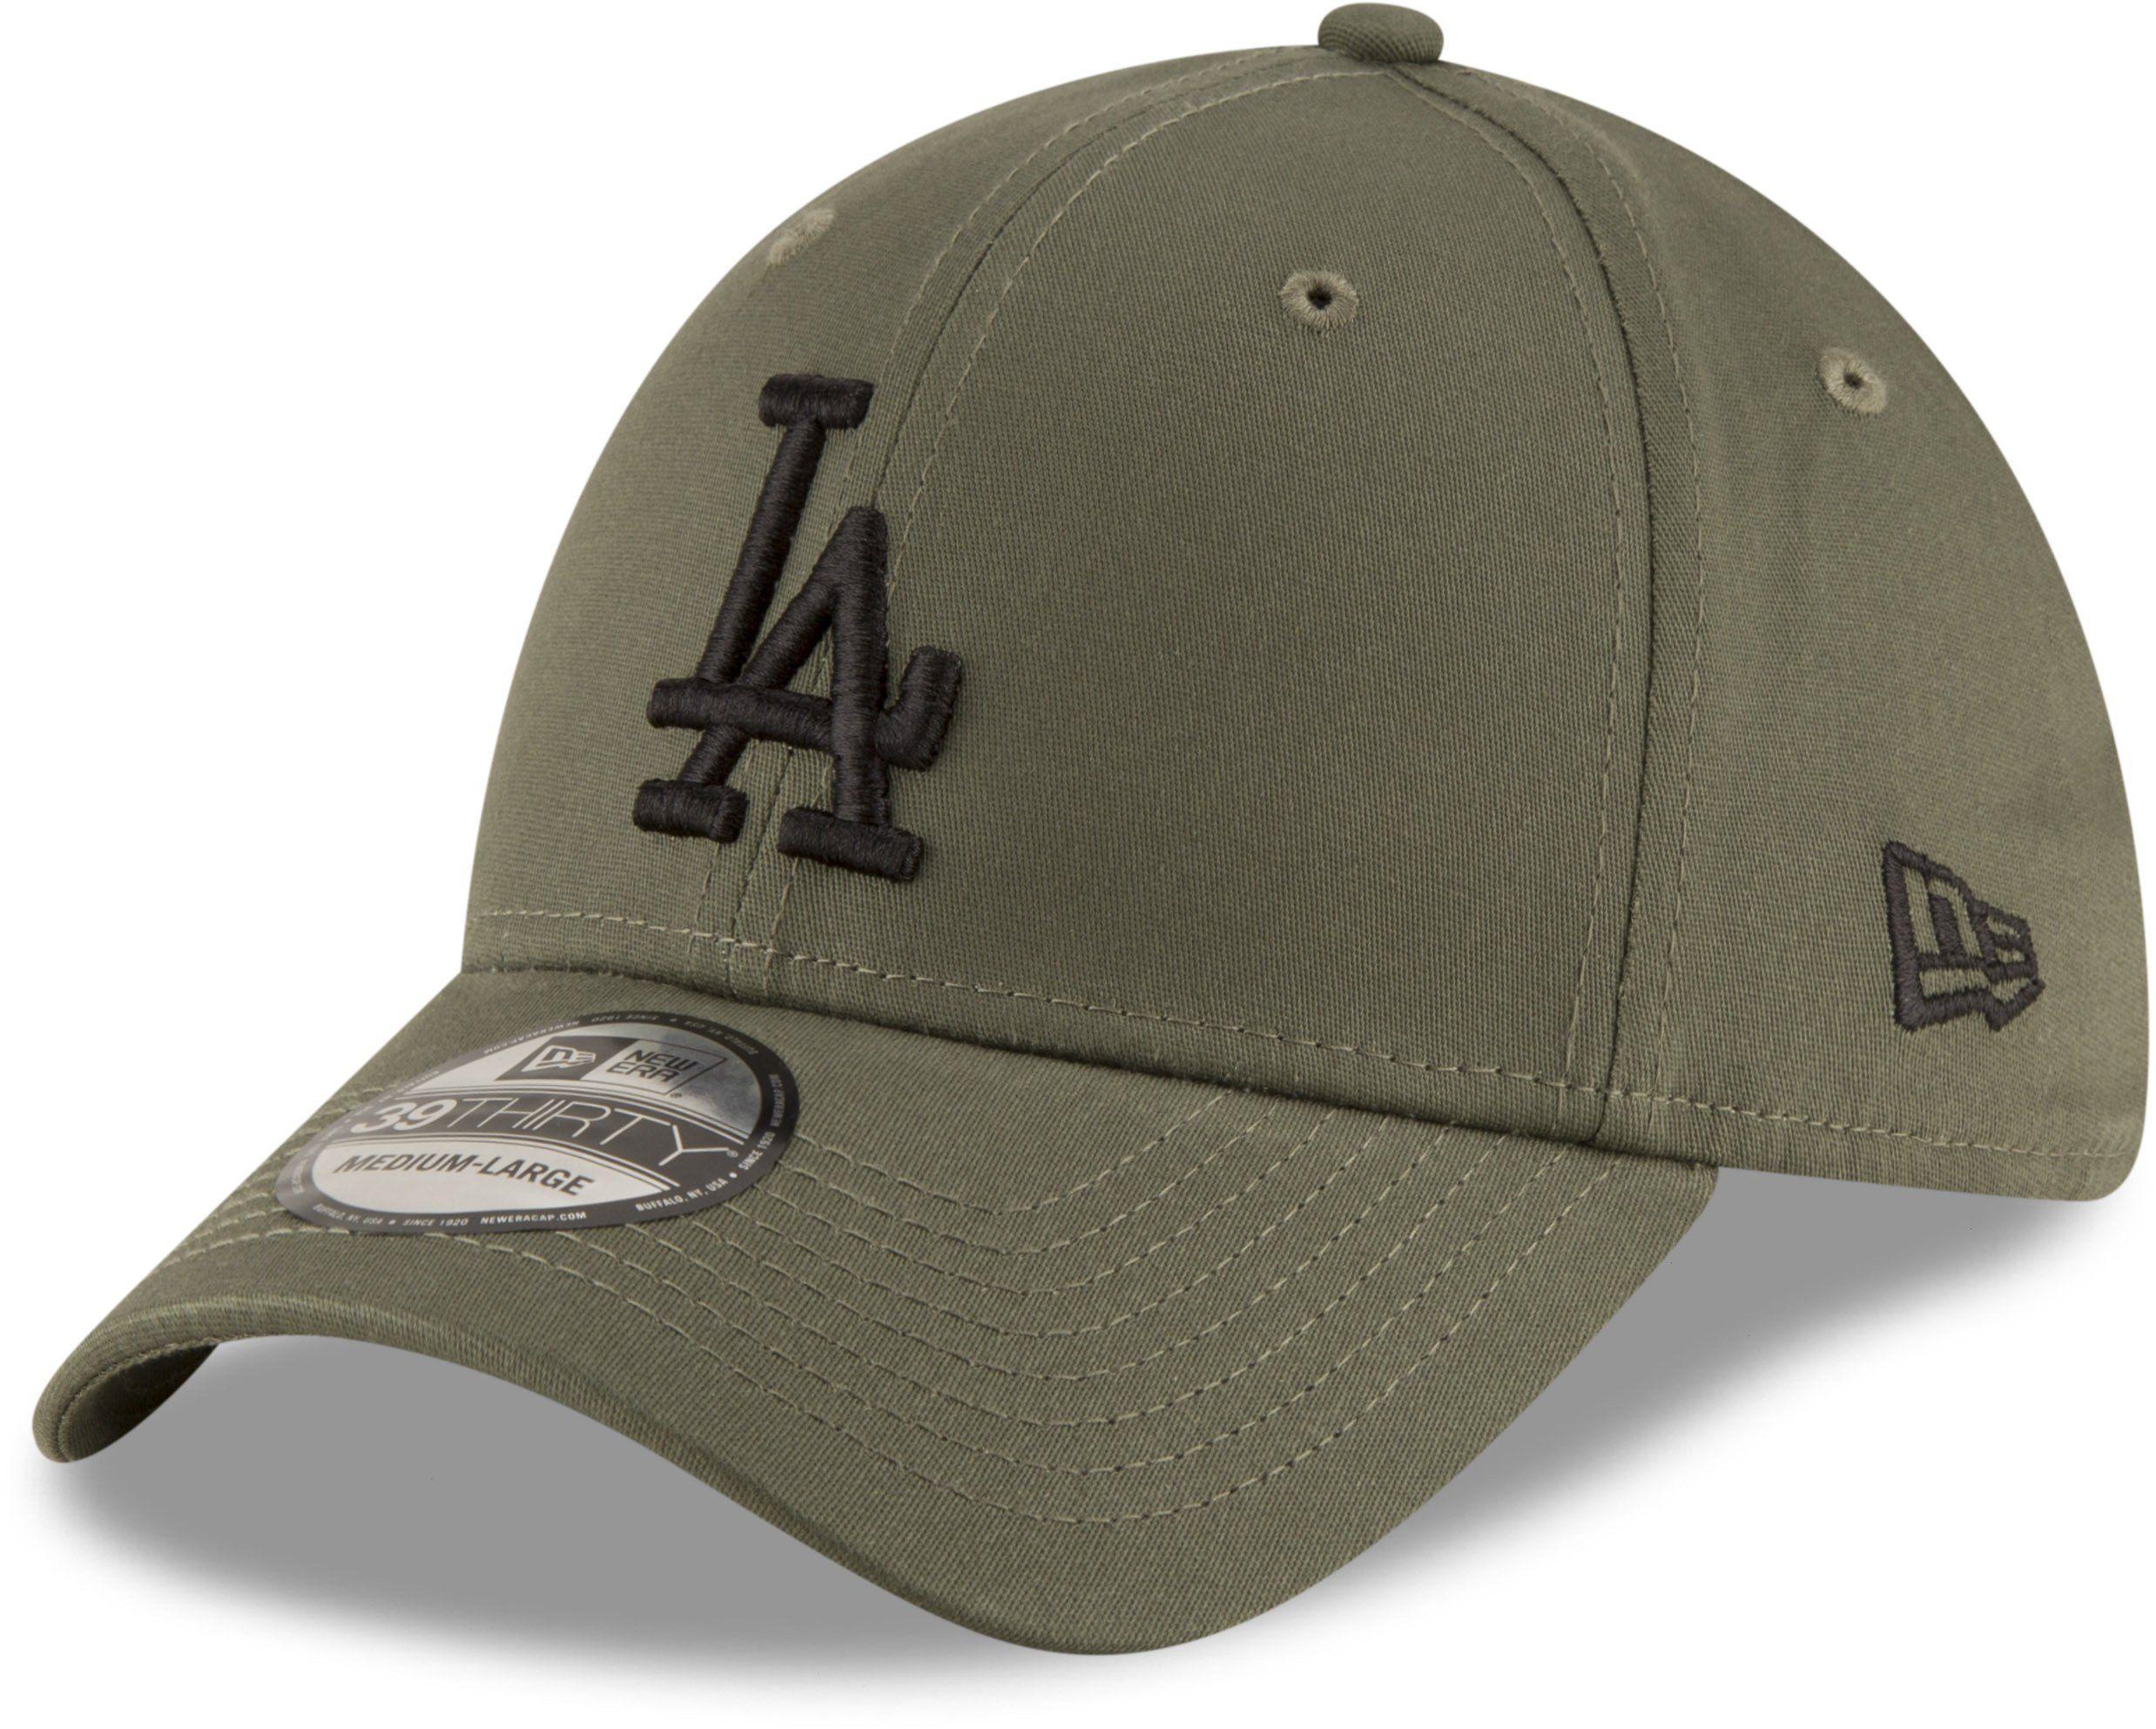 ca8d4c43a0b LA Dodgers New Era 3930 League Essential Khaki Stretch Fit Baseball Ca –  lovemycap